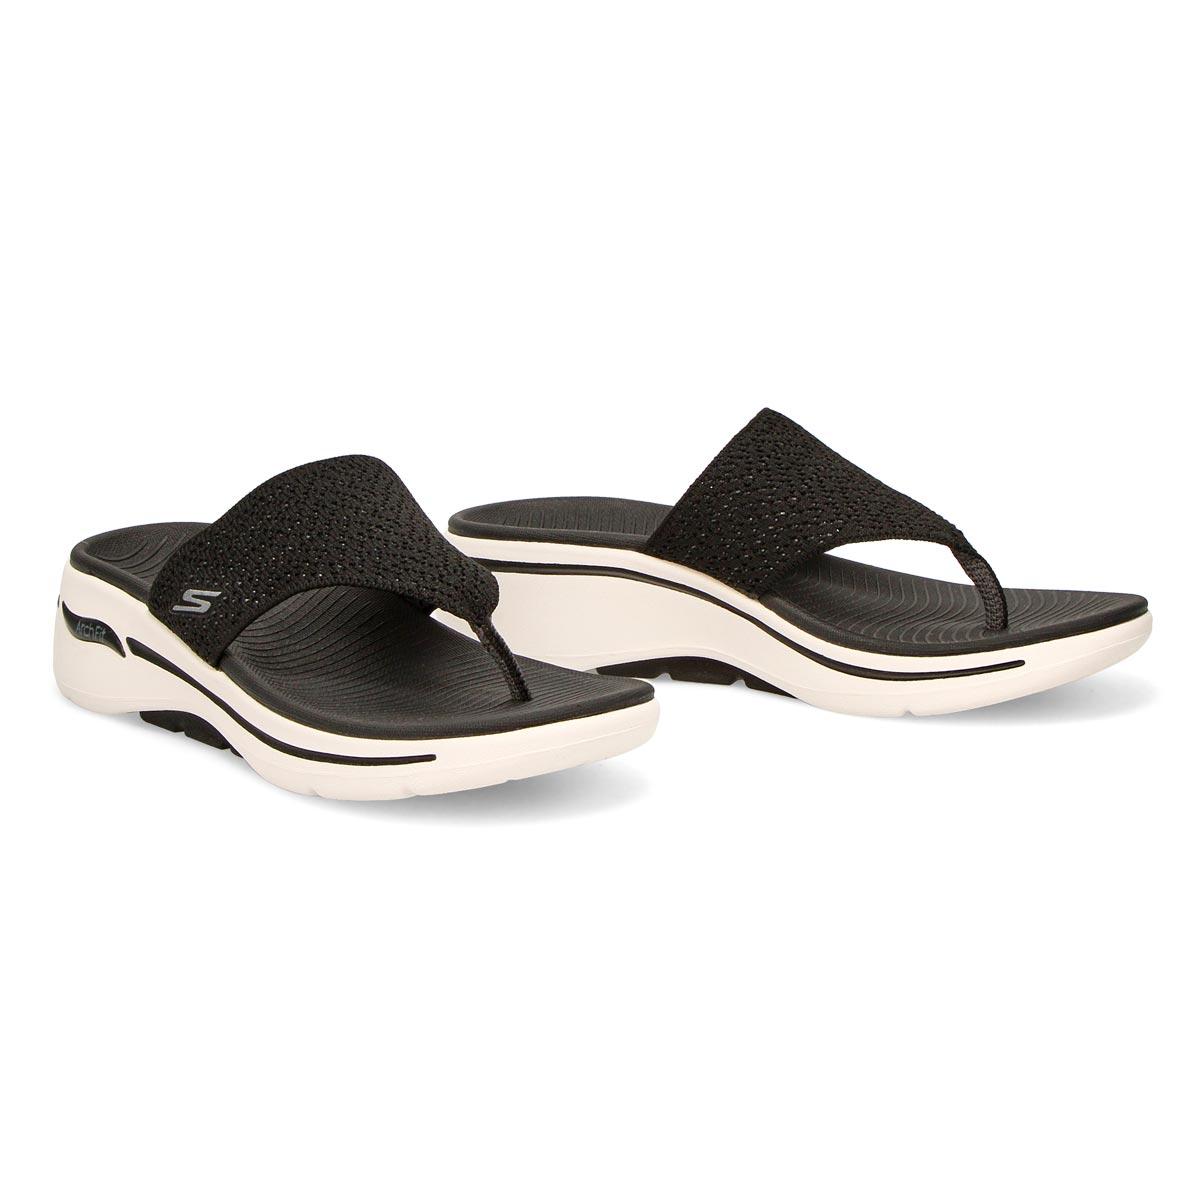 Women's Go Walk Arch Fit Sandal - Black/White